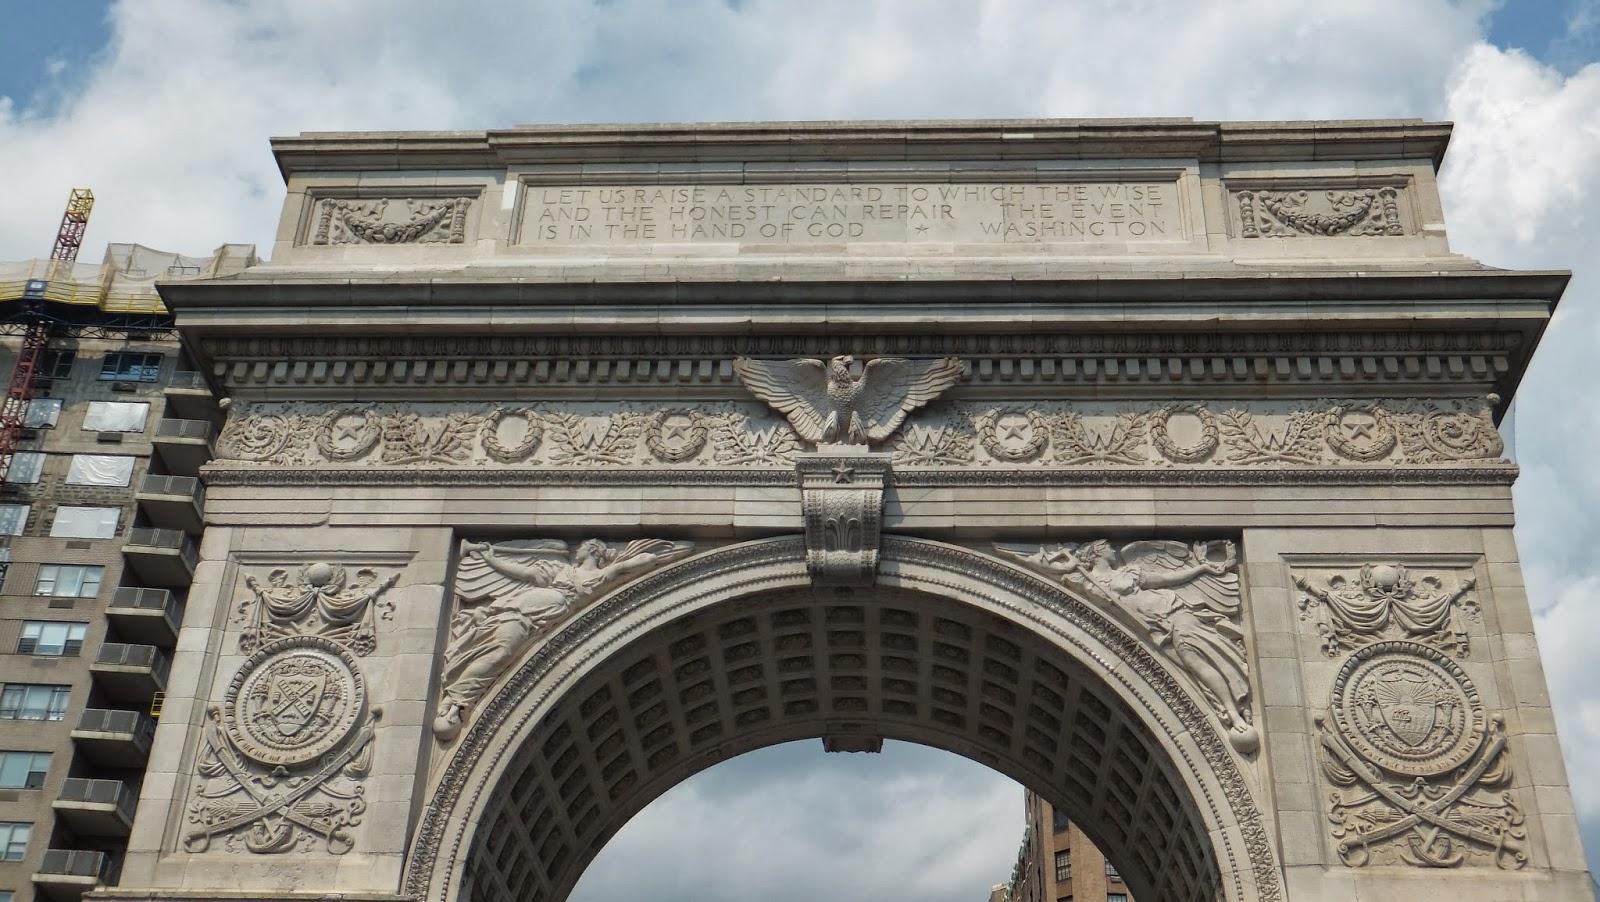 Washington Square Park, Manhattan, New York